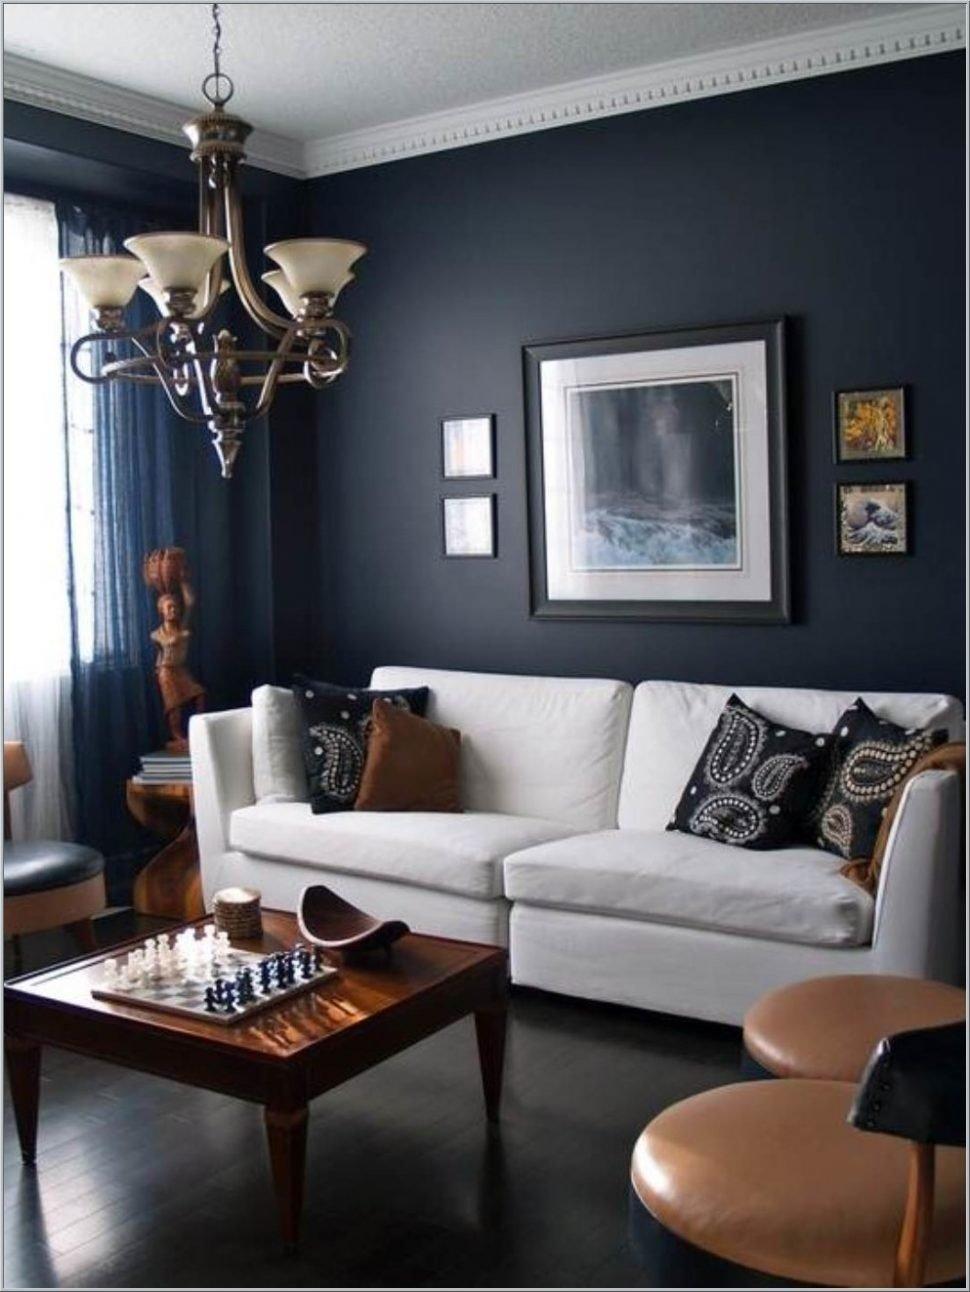 10 Awesome Living Room Ideas For Men living room 41 beautiful living room ideas for men image concept